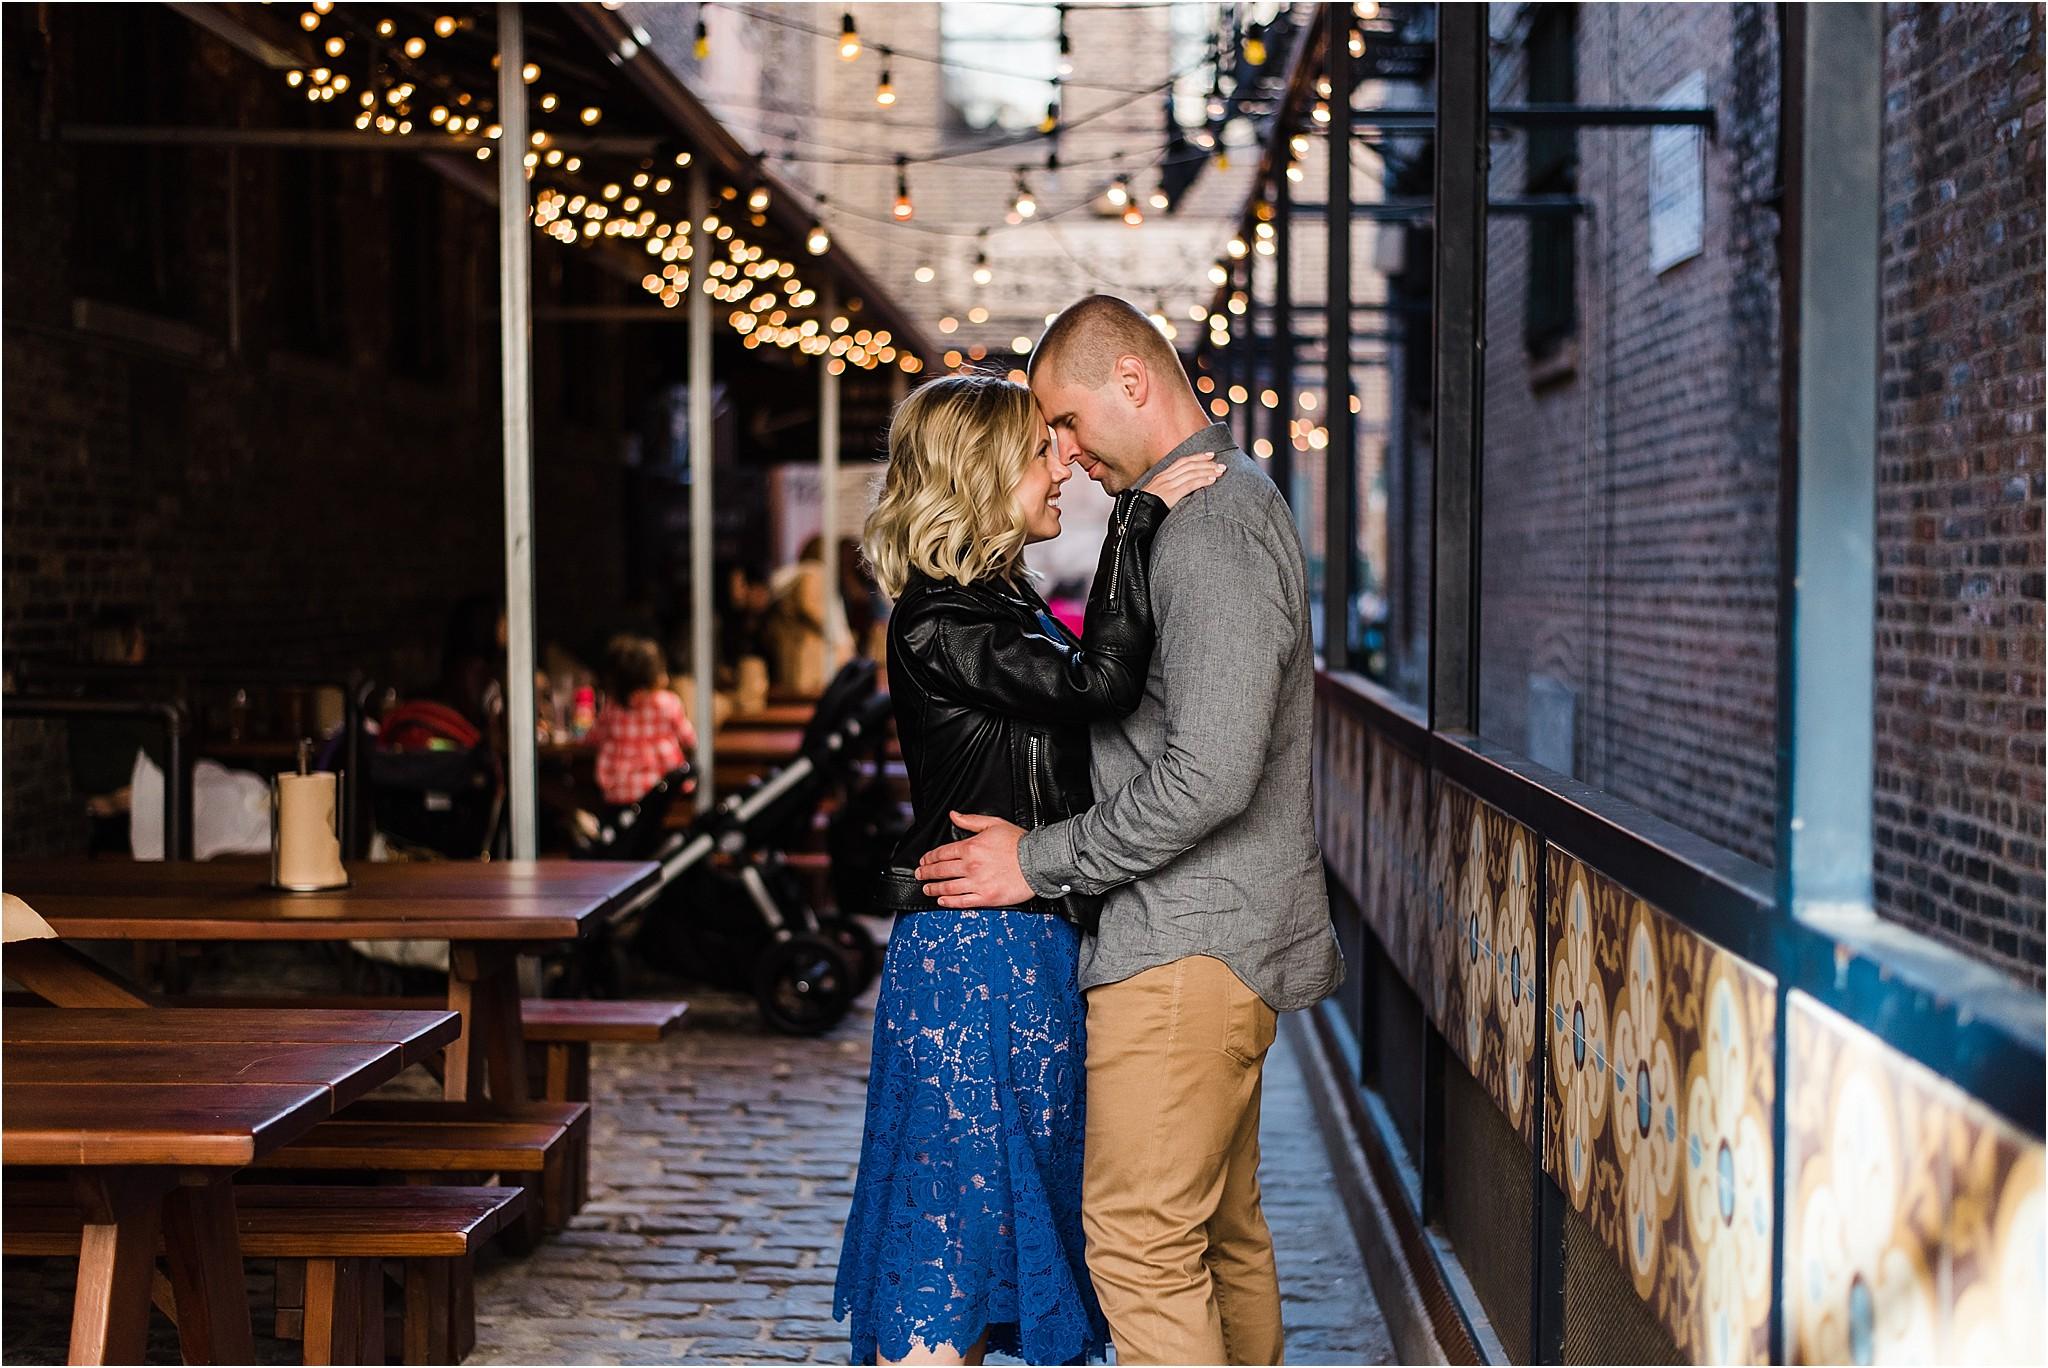 lish-marie-photography-wedding-photographer-chicago-west-loop_0012.jpg